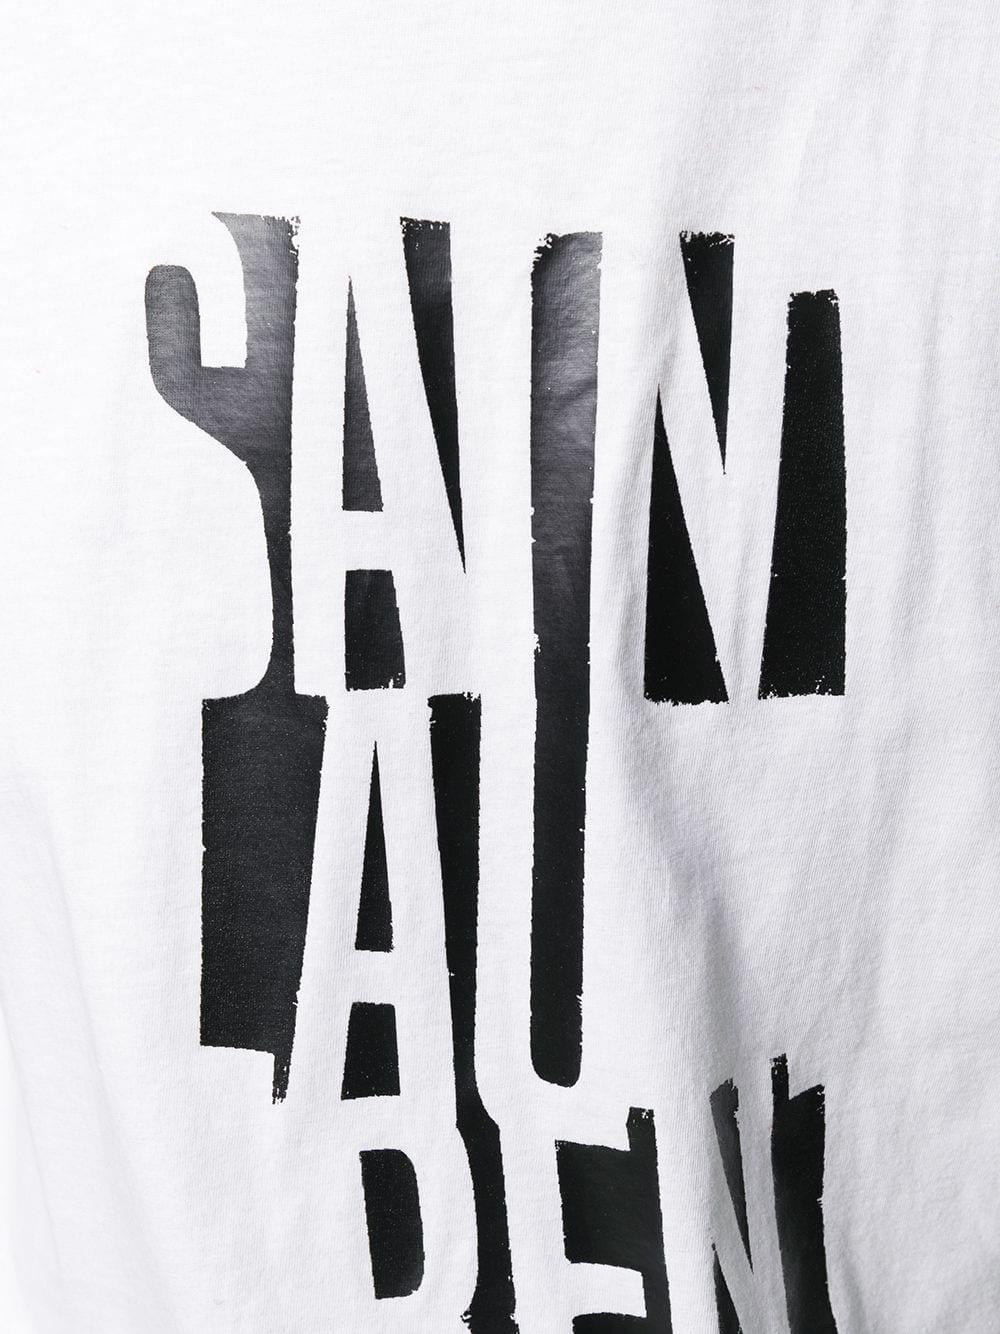 87191fed2c7 T-Shirt Bianca Poster Saint Laurent - SAINT LAURENT - Russocapri